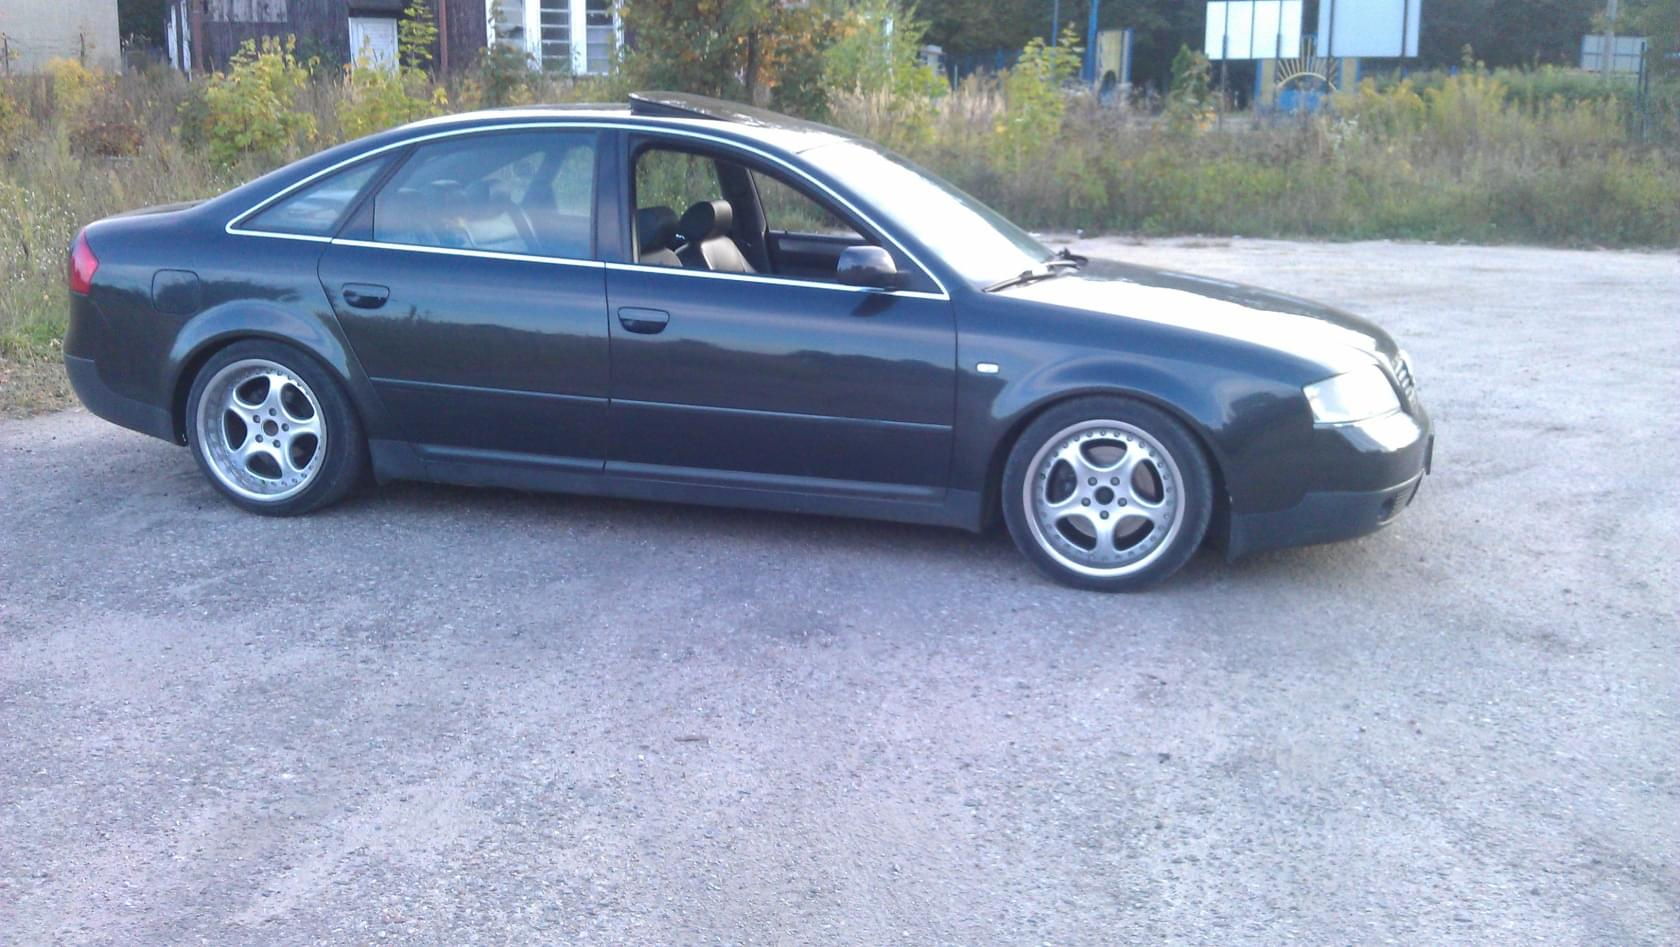 Pomoc W Doborze Felg Audi A6 C5 C5 1997 2004